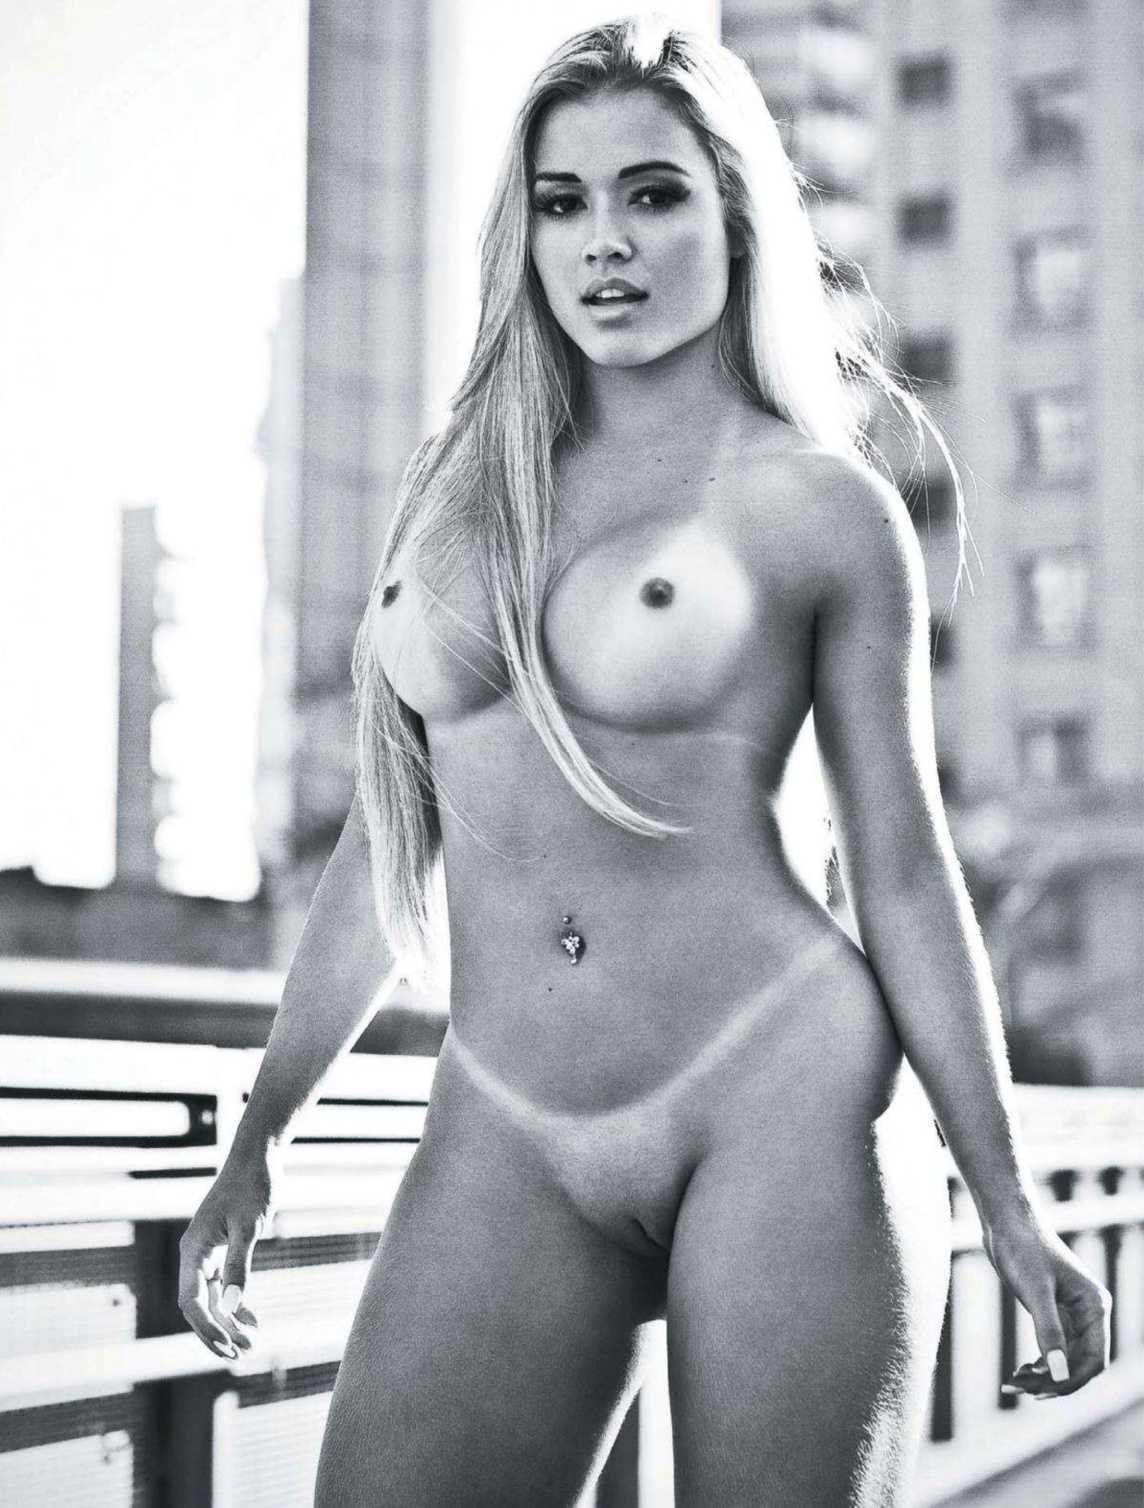 Playboy - Aryane Steinkopf - Abril De 2012 - NUDE PLAYBOY GIRLS: nude-playboy-girls.blogspot.com/2012/11/playboy-aryane-steinkopf...